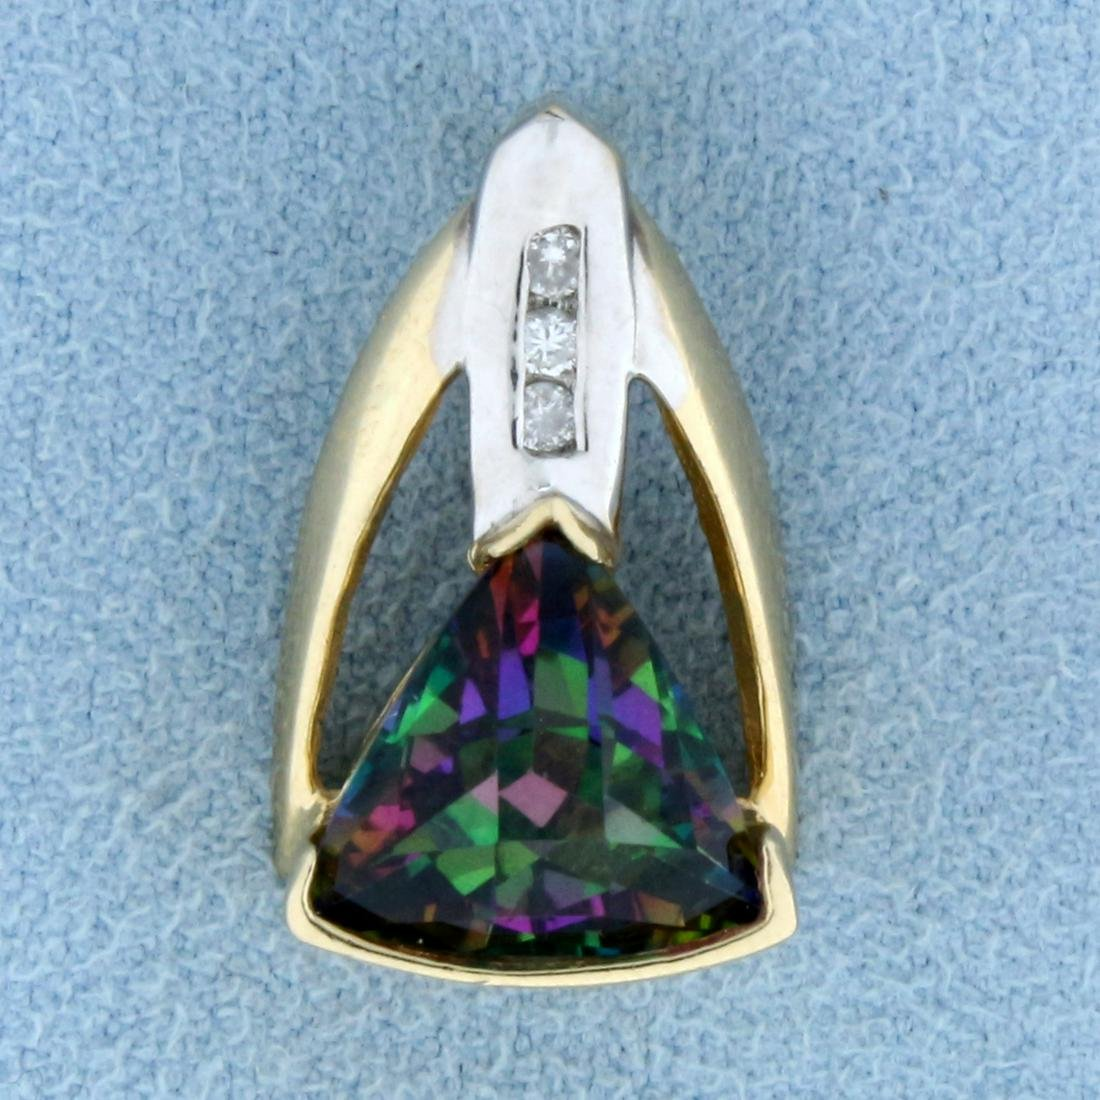 Mystic Topaz and Diamond Pendant in 14k Gold